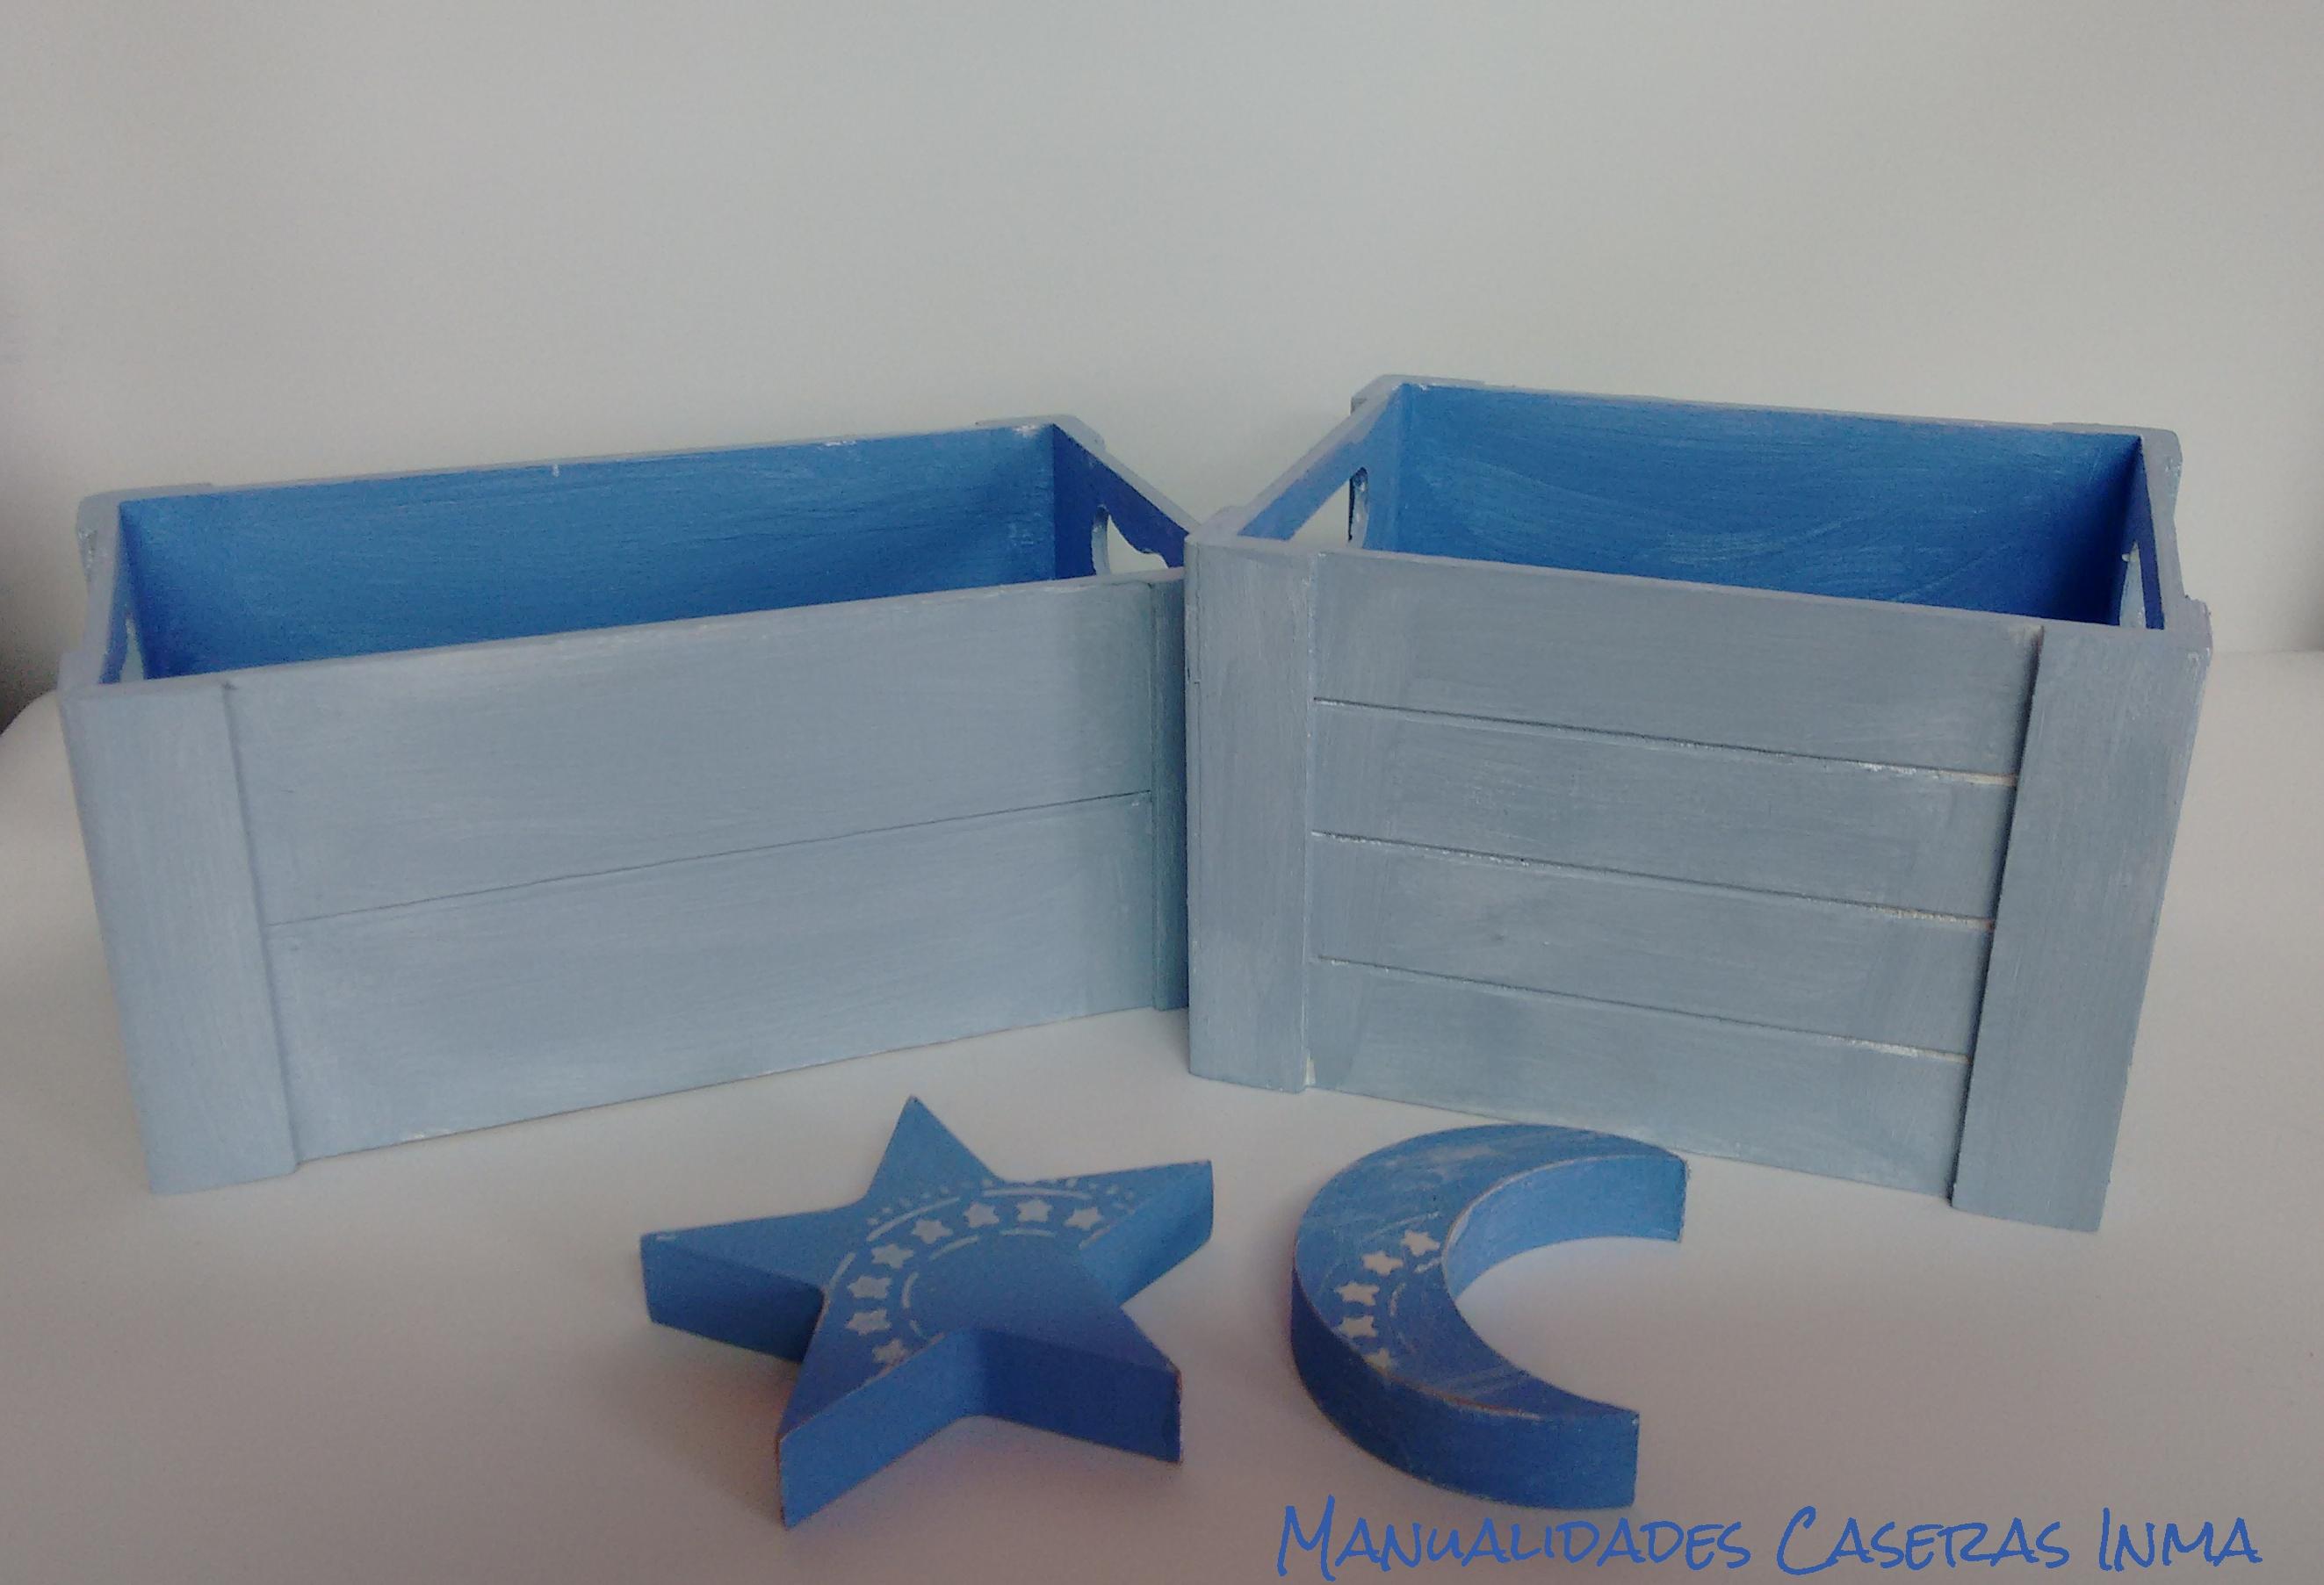 Manualidades Caseras Inma_ cajas para chuches y regalos pintadas en dos tonos de azules